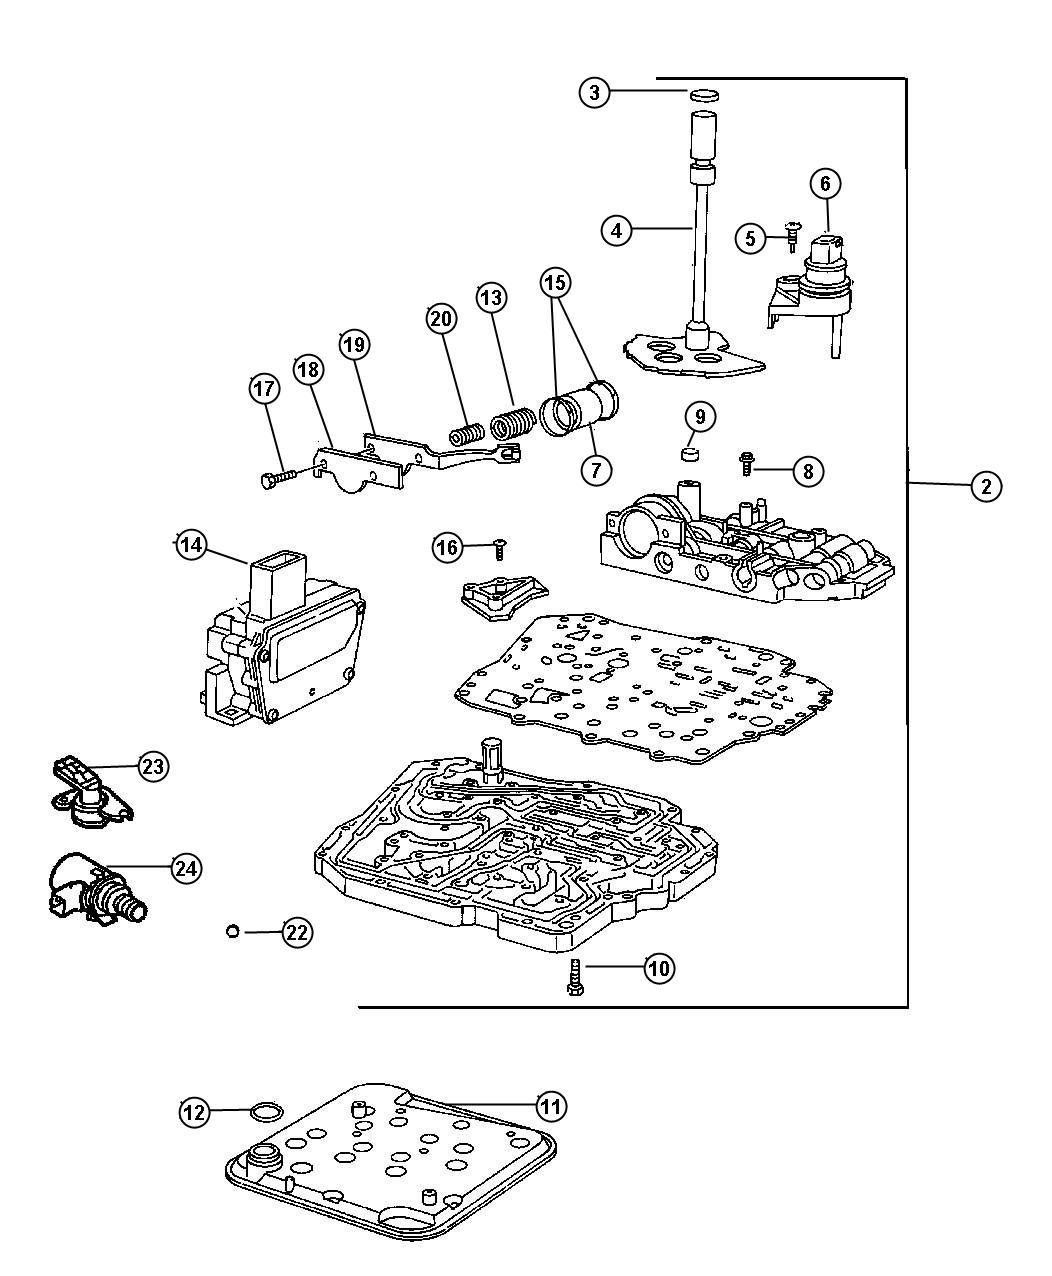 Dodge Charger Solenoid, solenoid package. Transmission